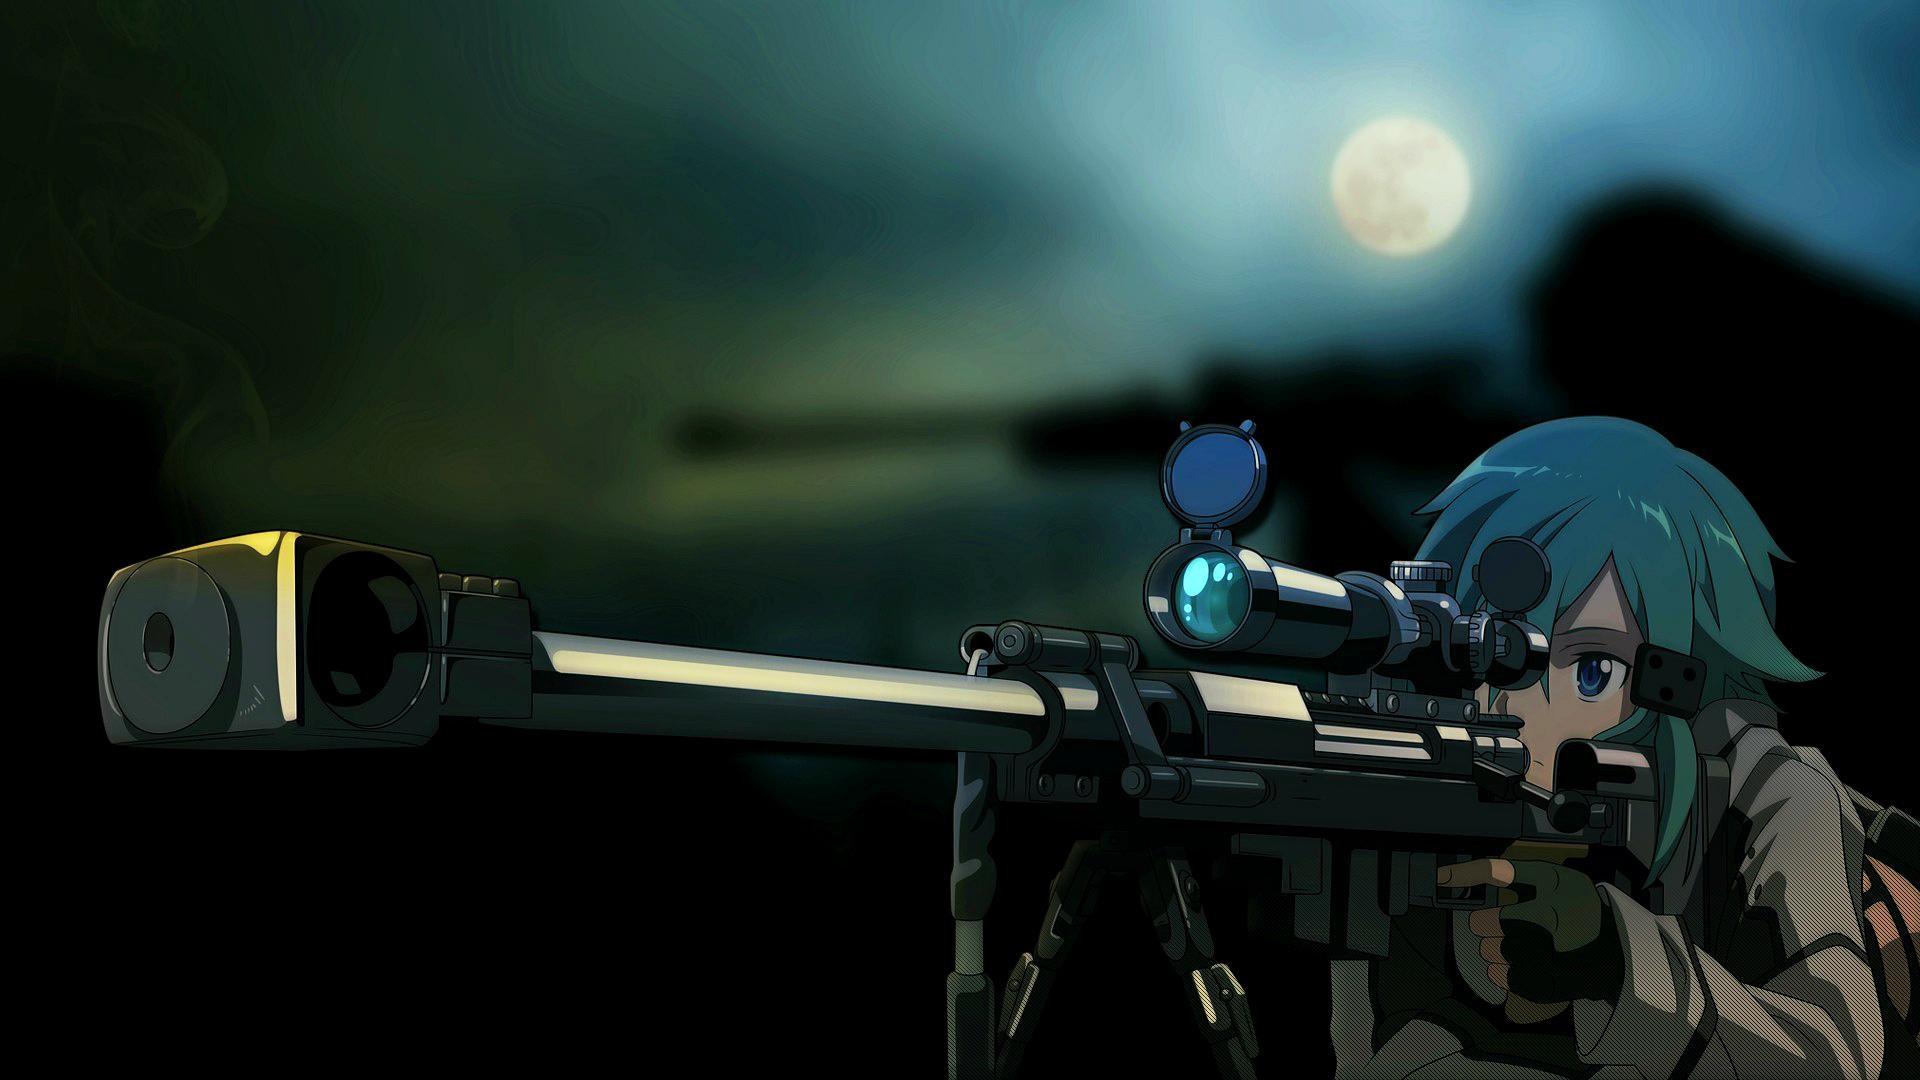 Epic Girl With Gun Wallpaper Anime Sniper Wallpaper 62 Images